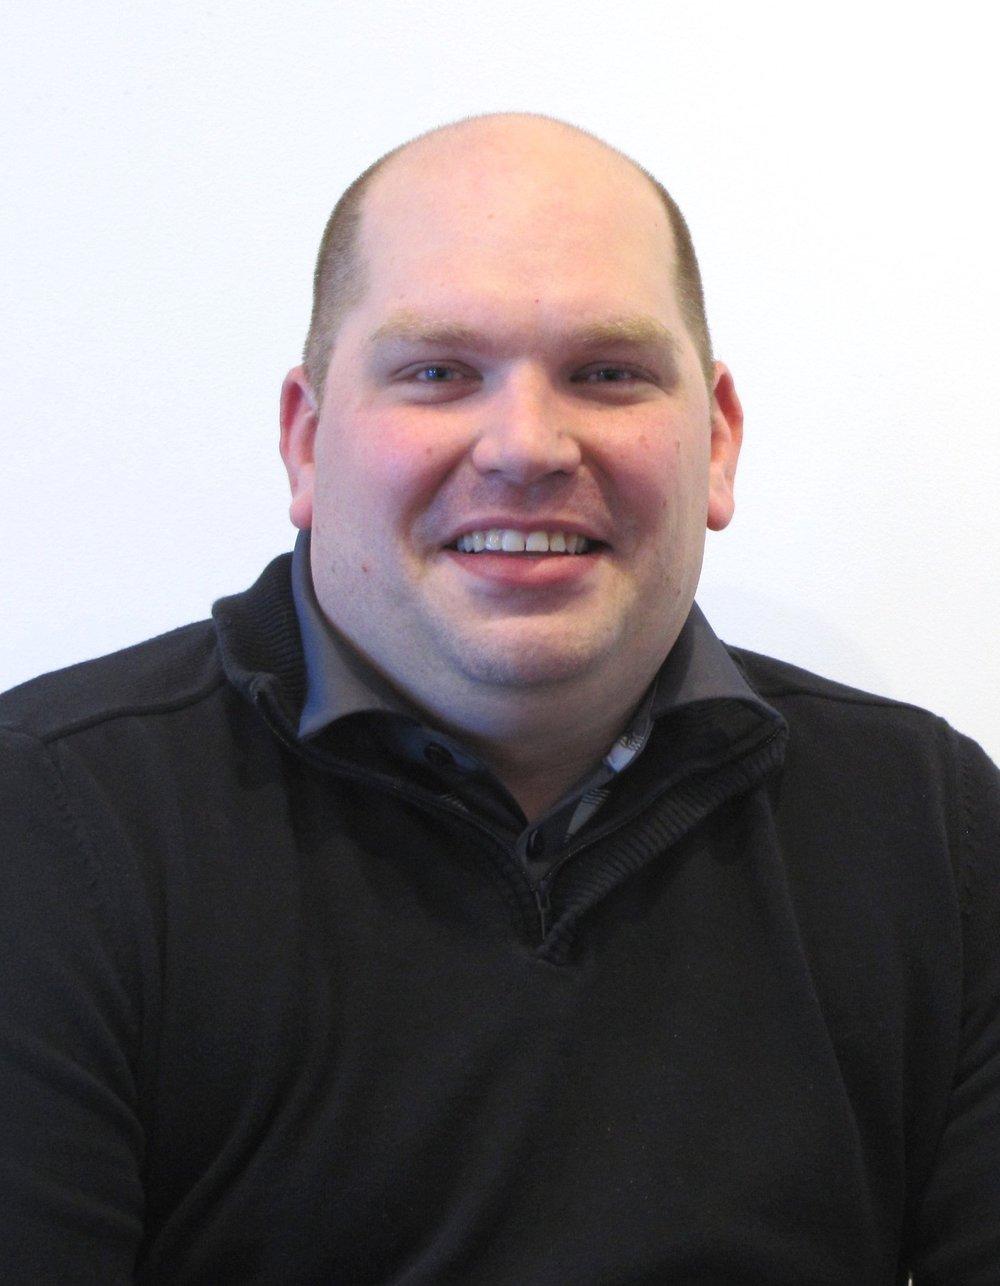 jEFFREY p. cOOK |  dIRECTOR OF STRUCTURAL ENGINEERING PRACTICES